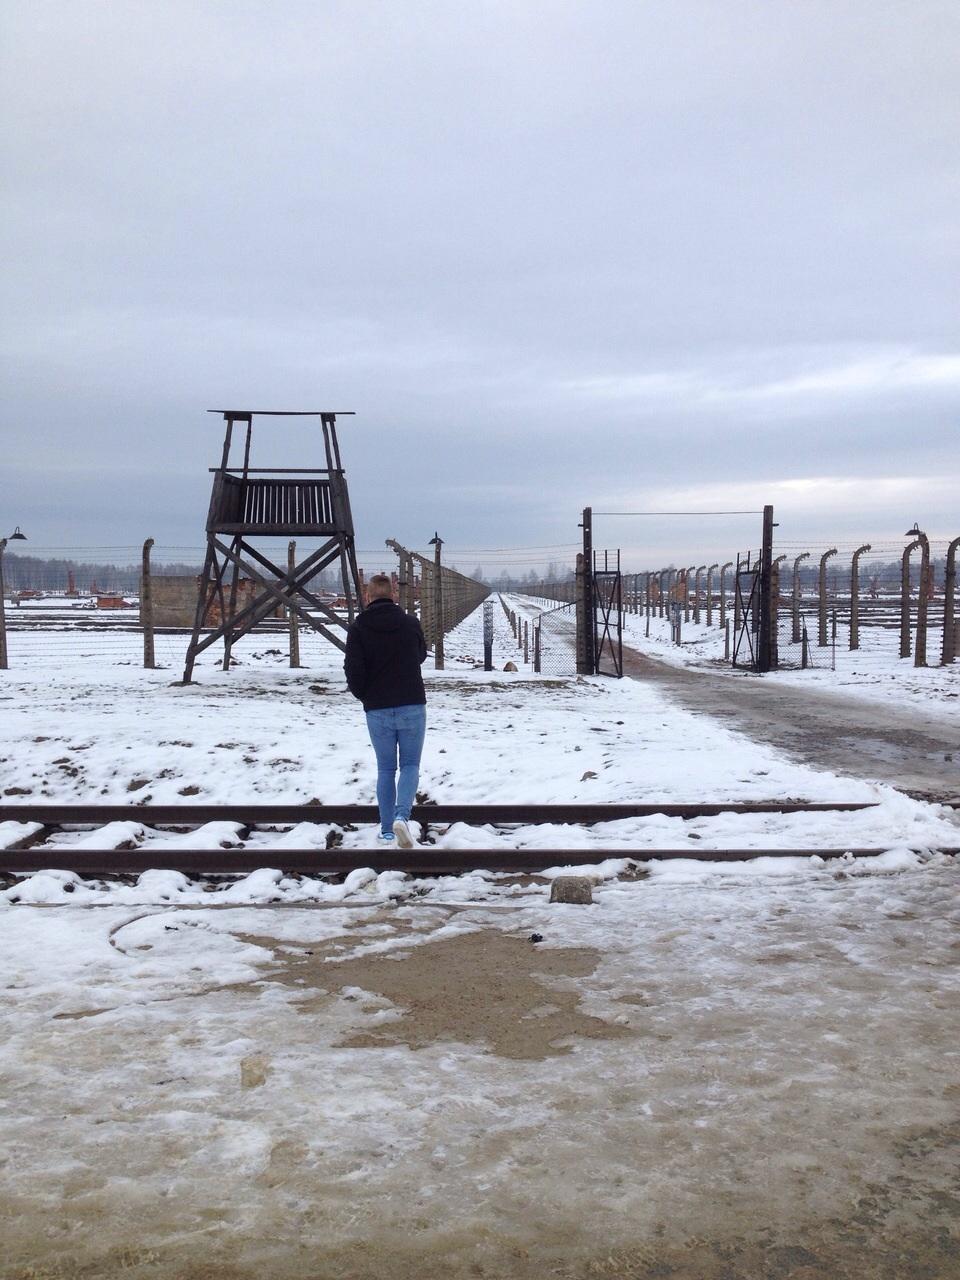 Taking in my surroundings at Auschwitz II-Birkenau.